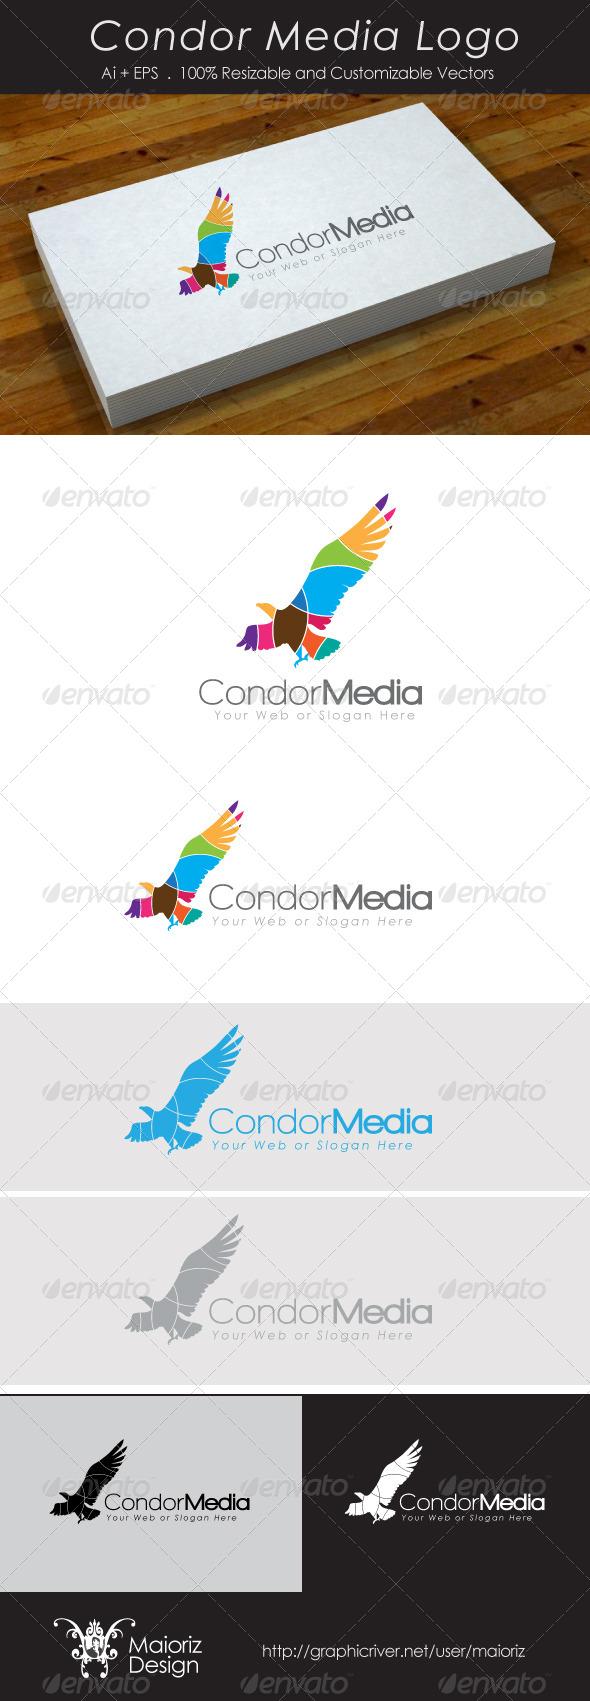 Condor Media Logo